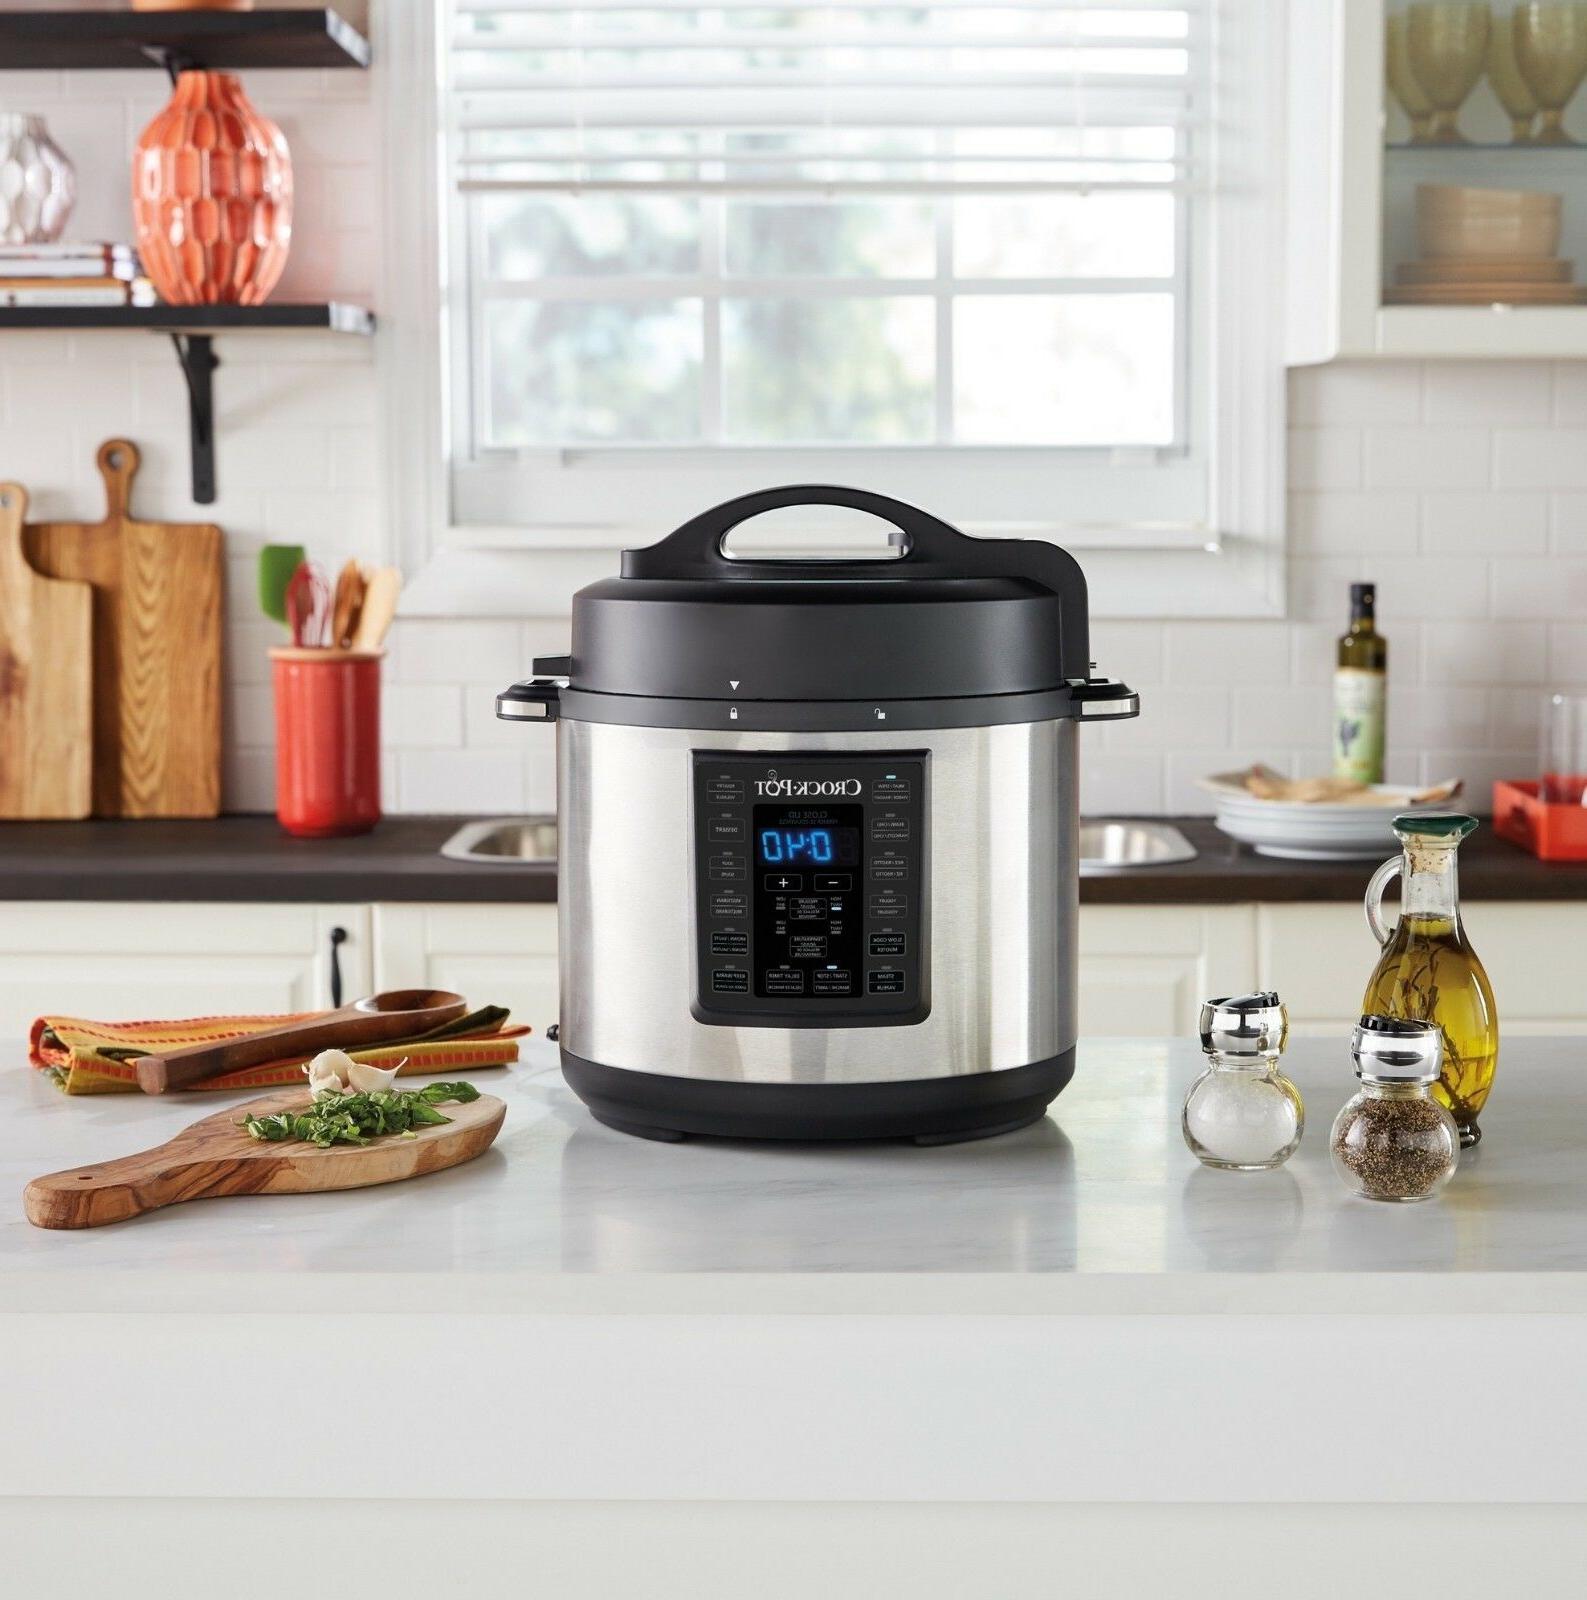 Crock-Pot Qt Multi-Use Express Slow Cooker, Pressure